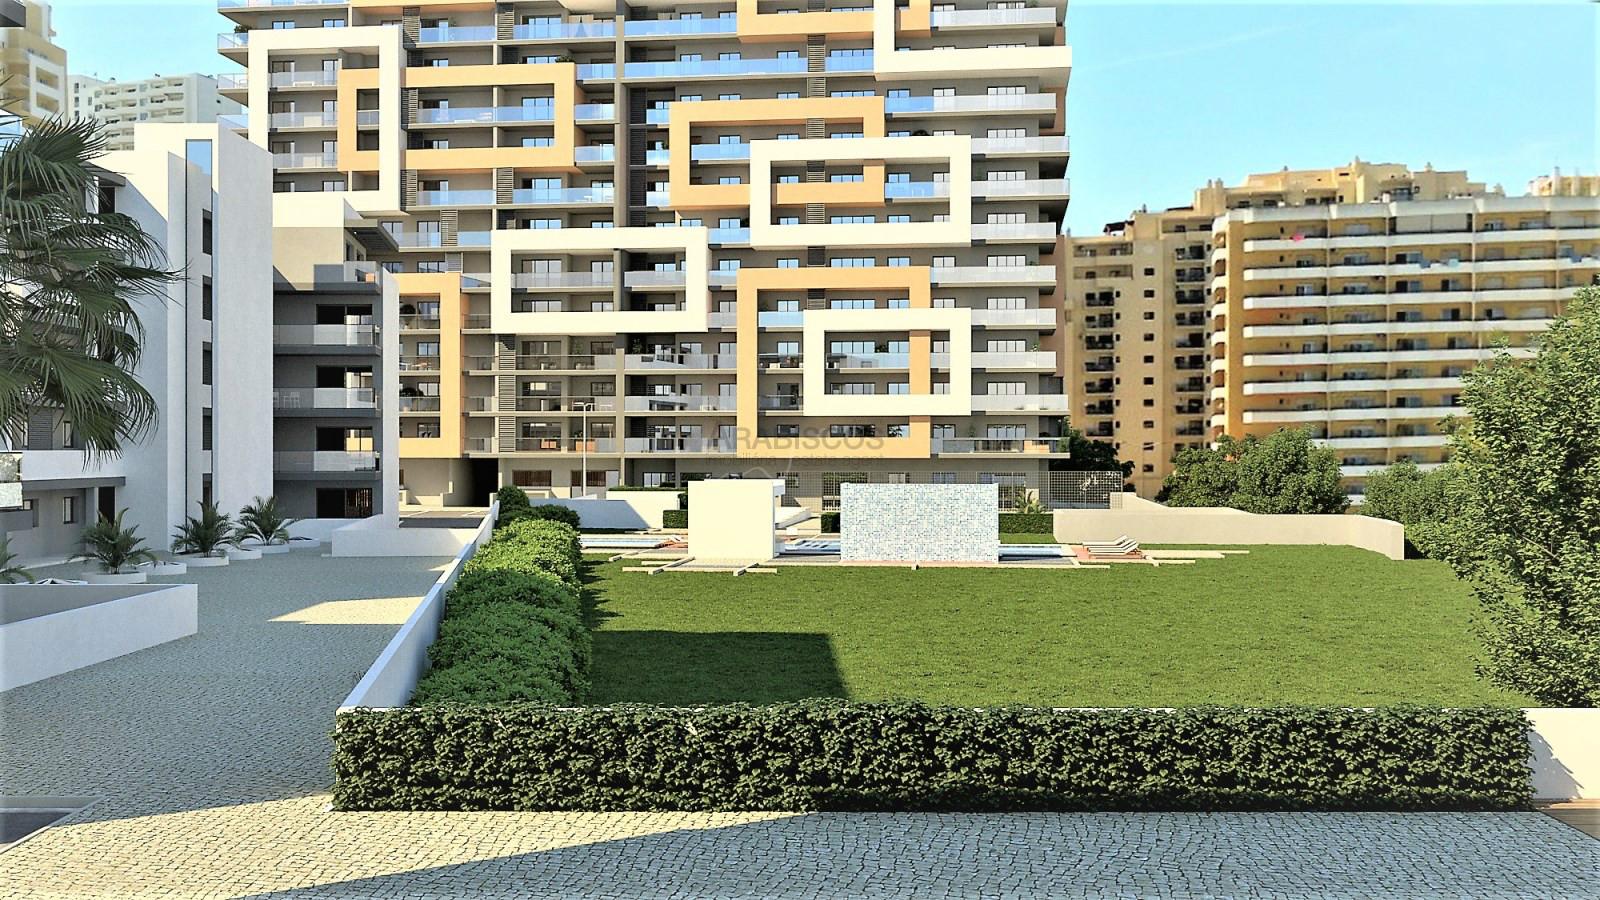 Apartamento T1 - Condominio privado - Espacios de ocio - Praia da Rocha